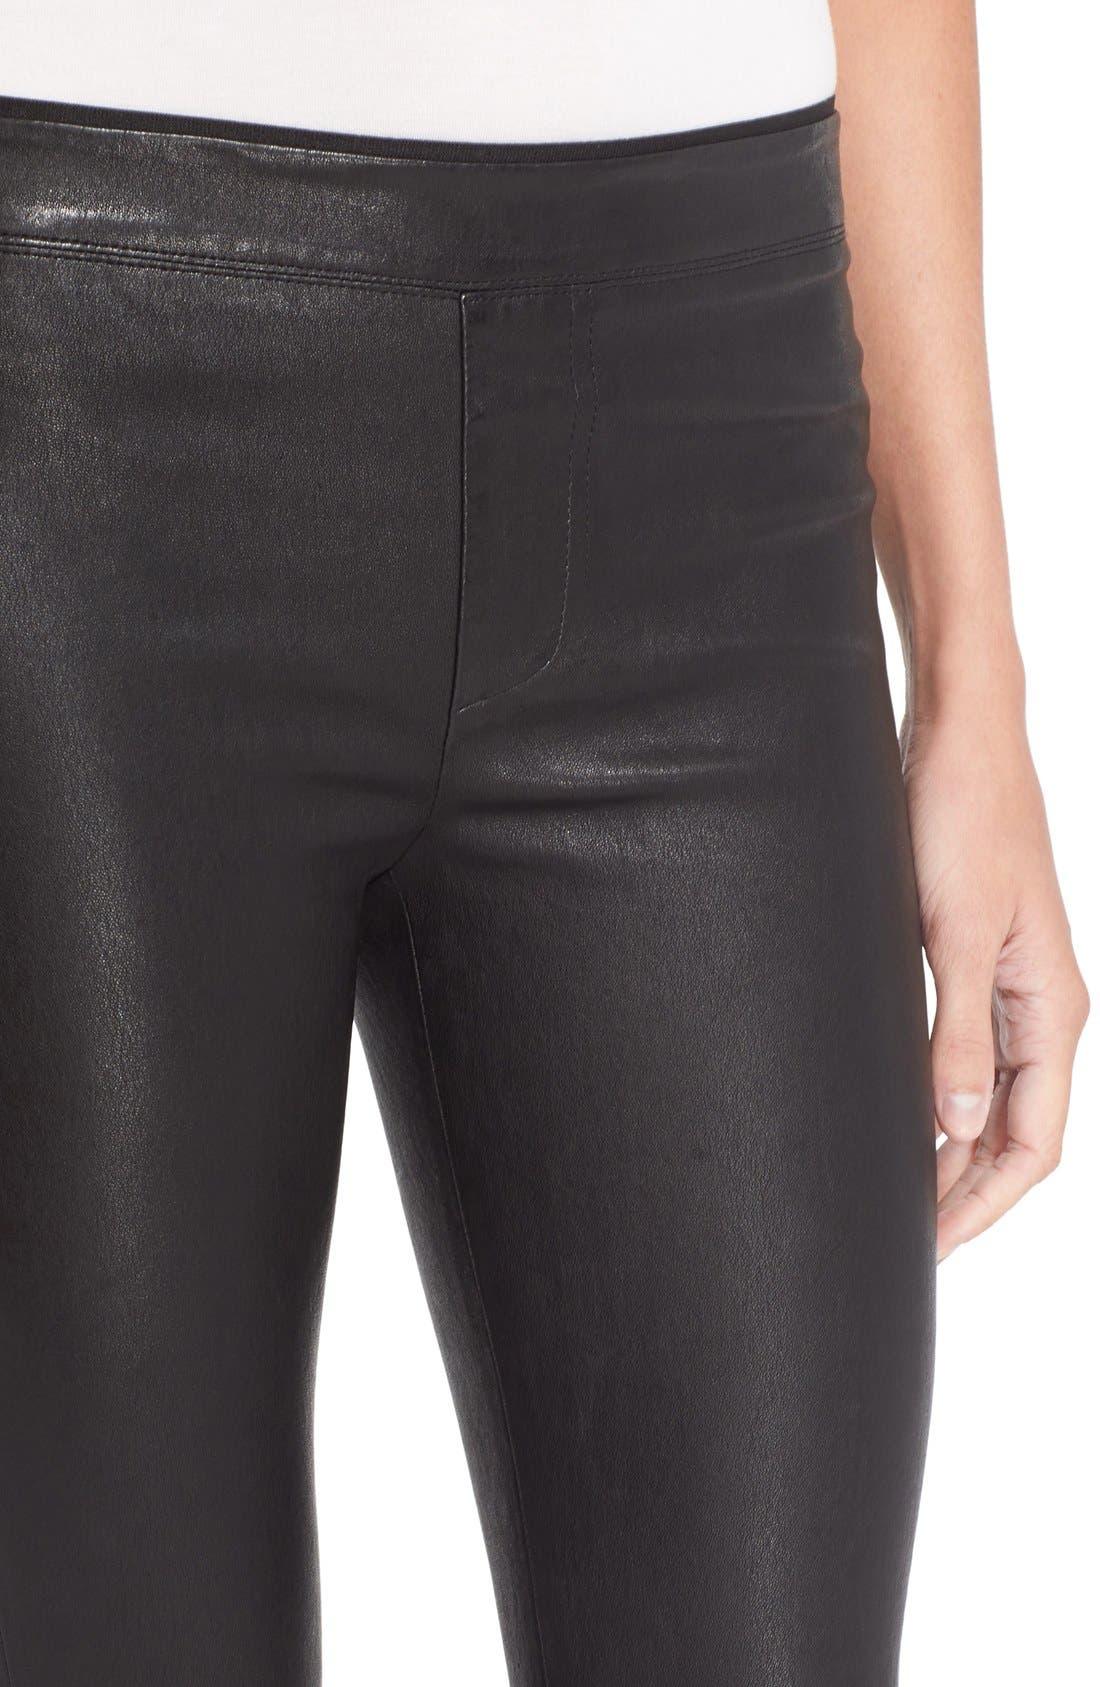 HELMUT LANG, Stretch Lambskin Leather Leggings, Alternate thumbnail 12, color, BLACK